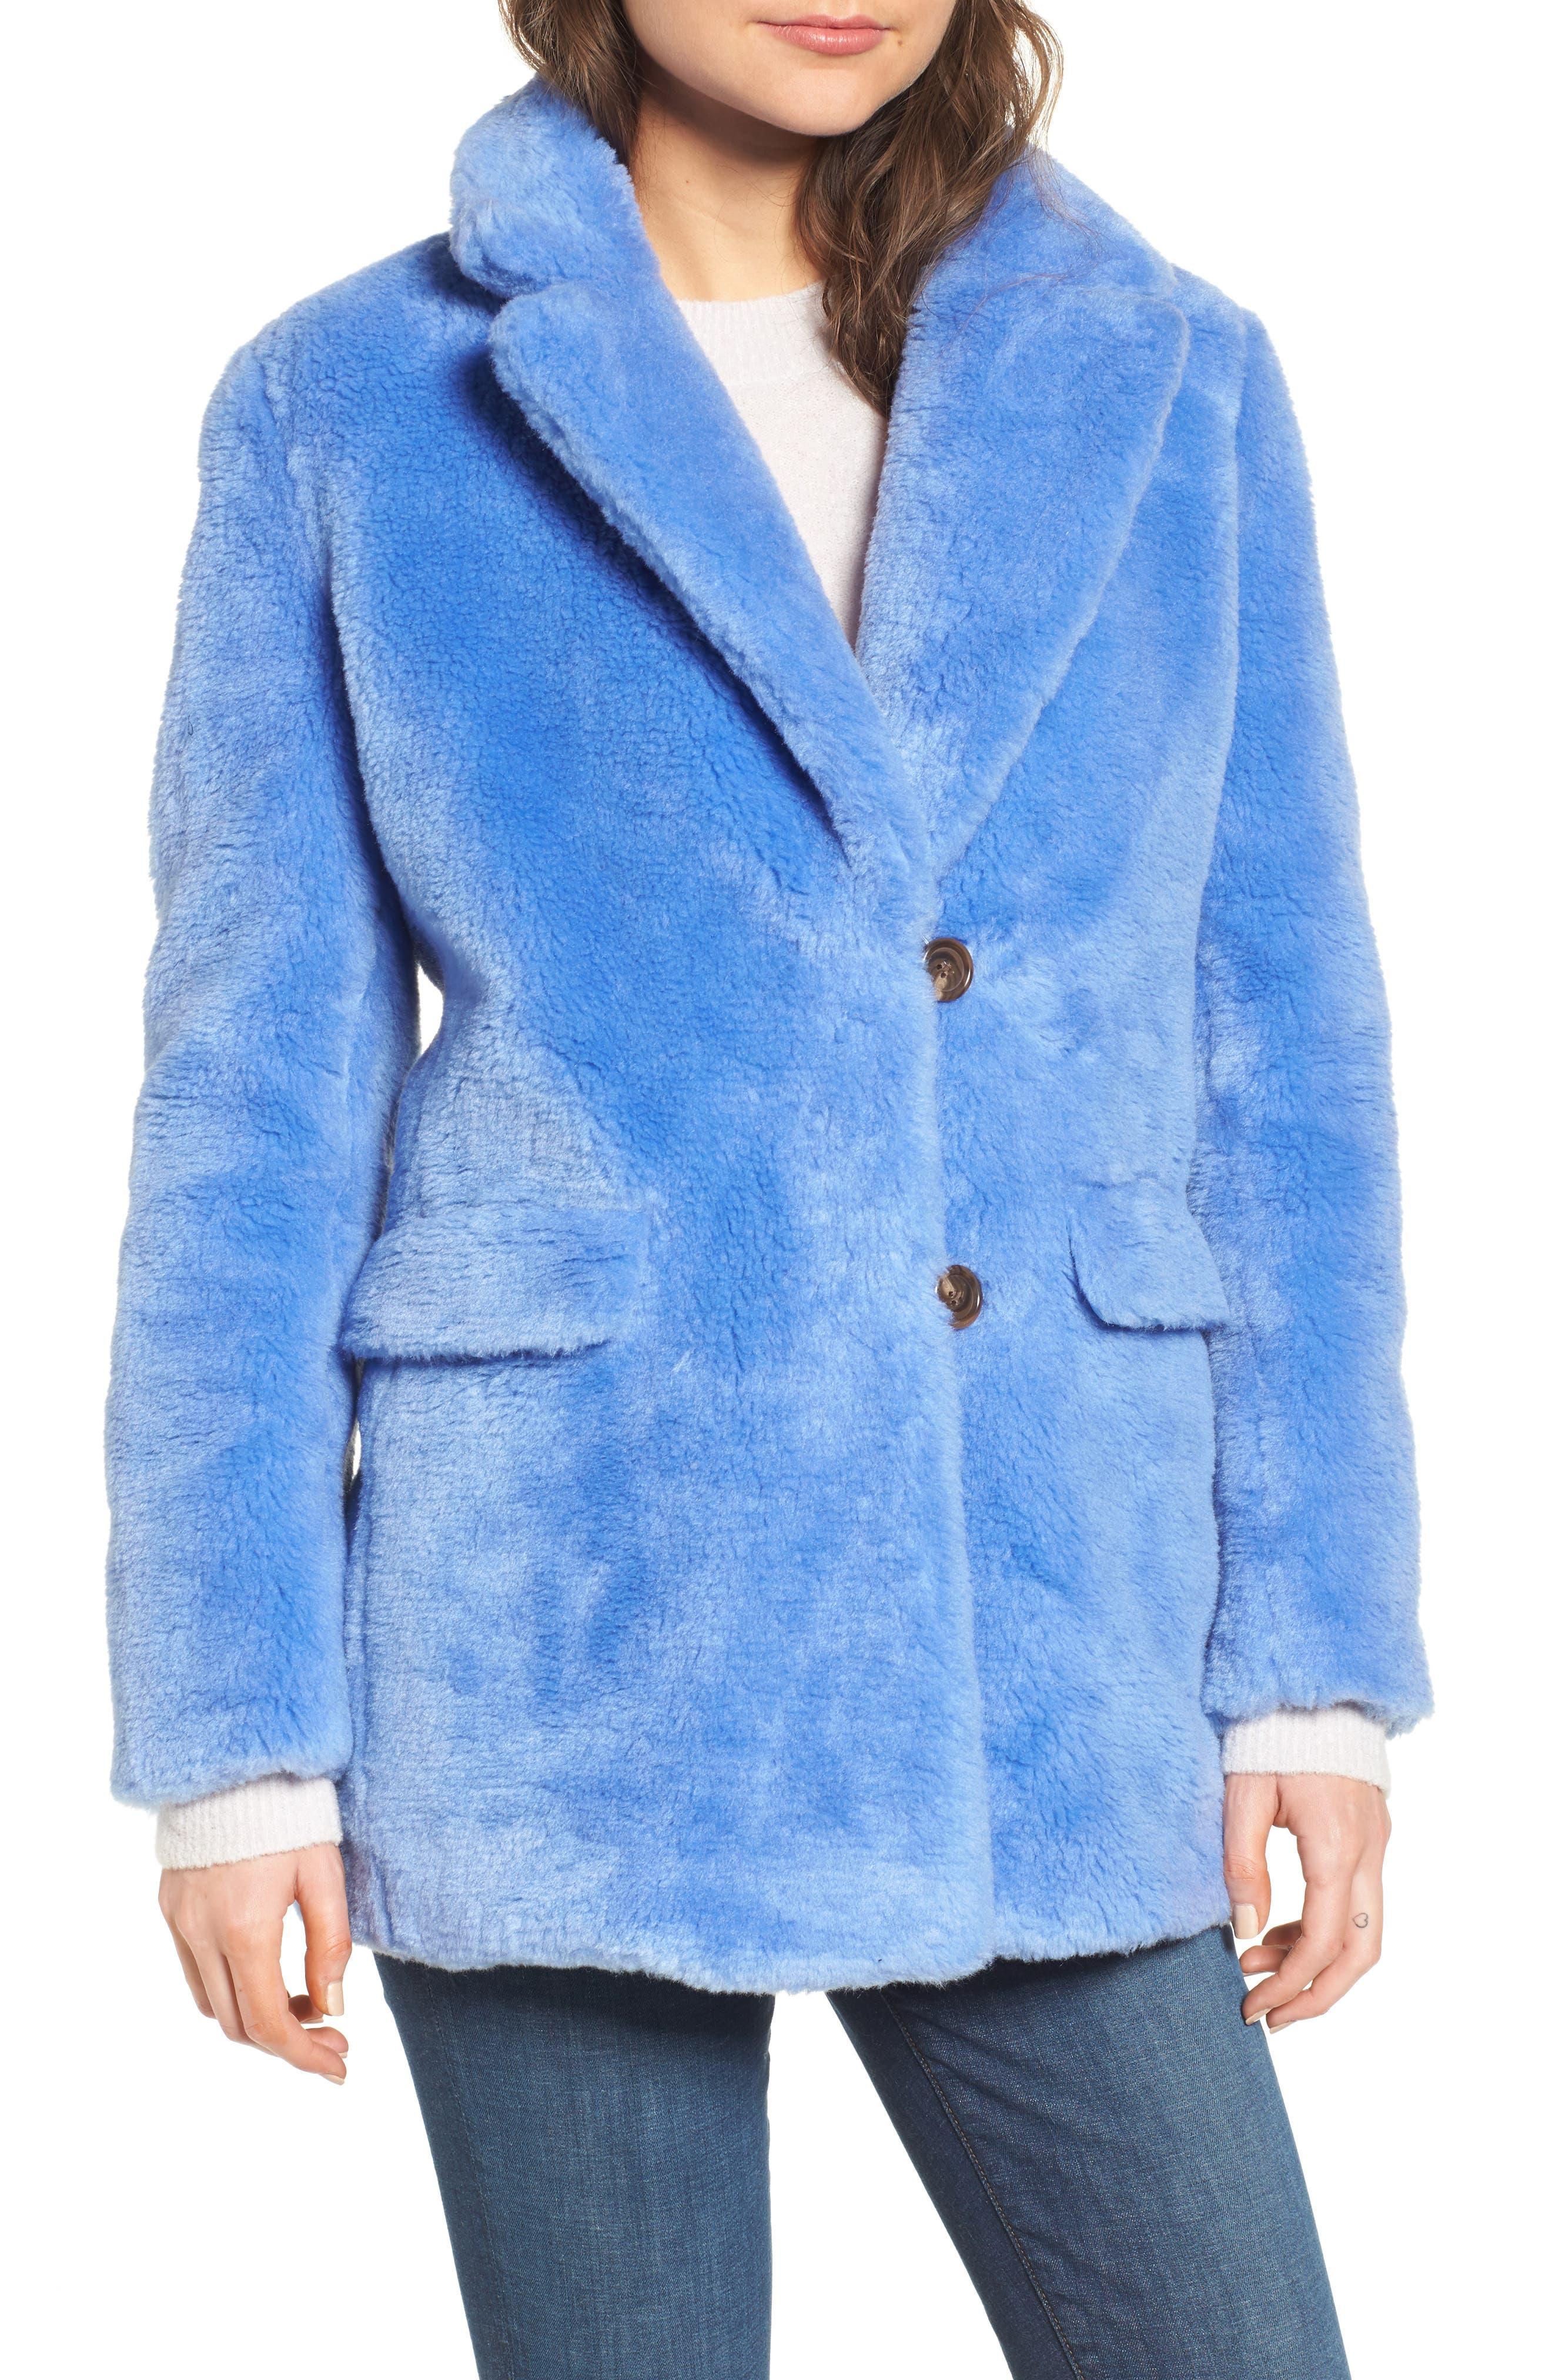 Yuna Teddy Faux Fur Jacket,                             Alternate thumbnail 7, color,